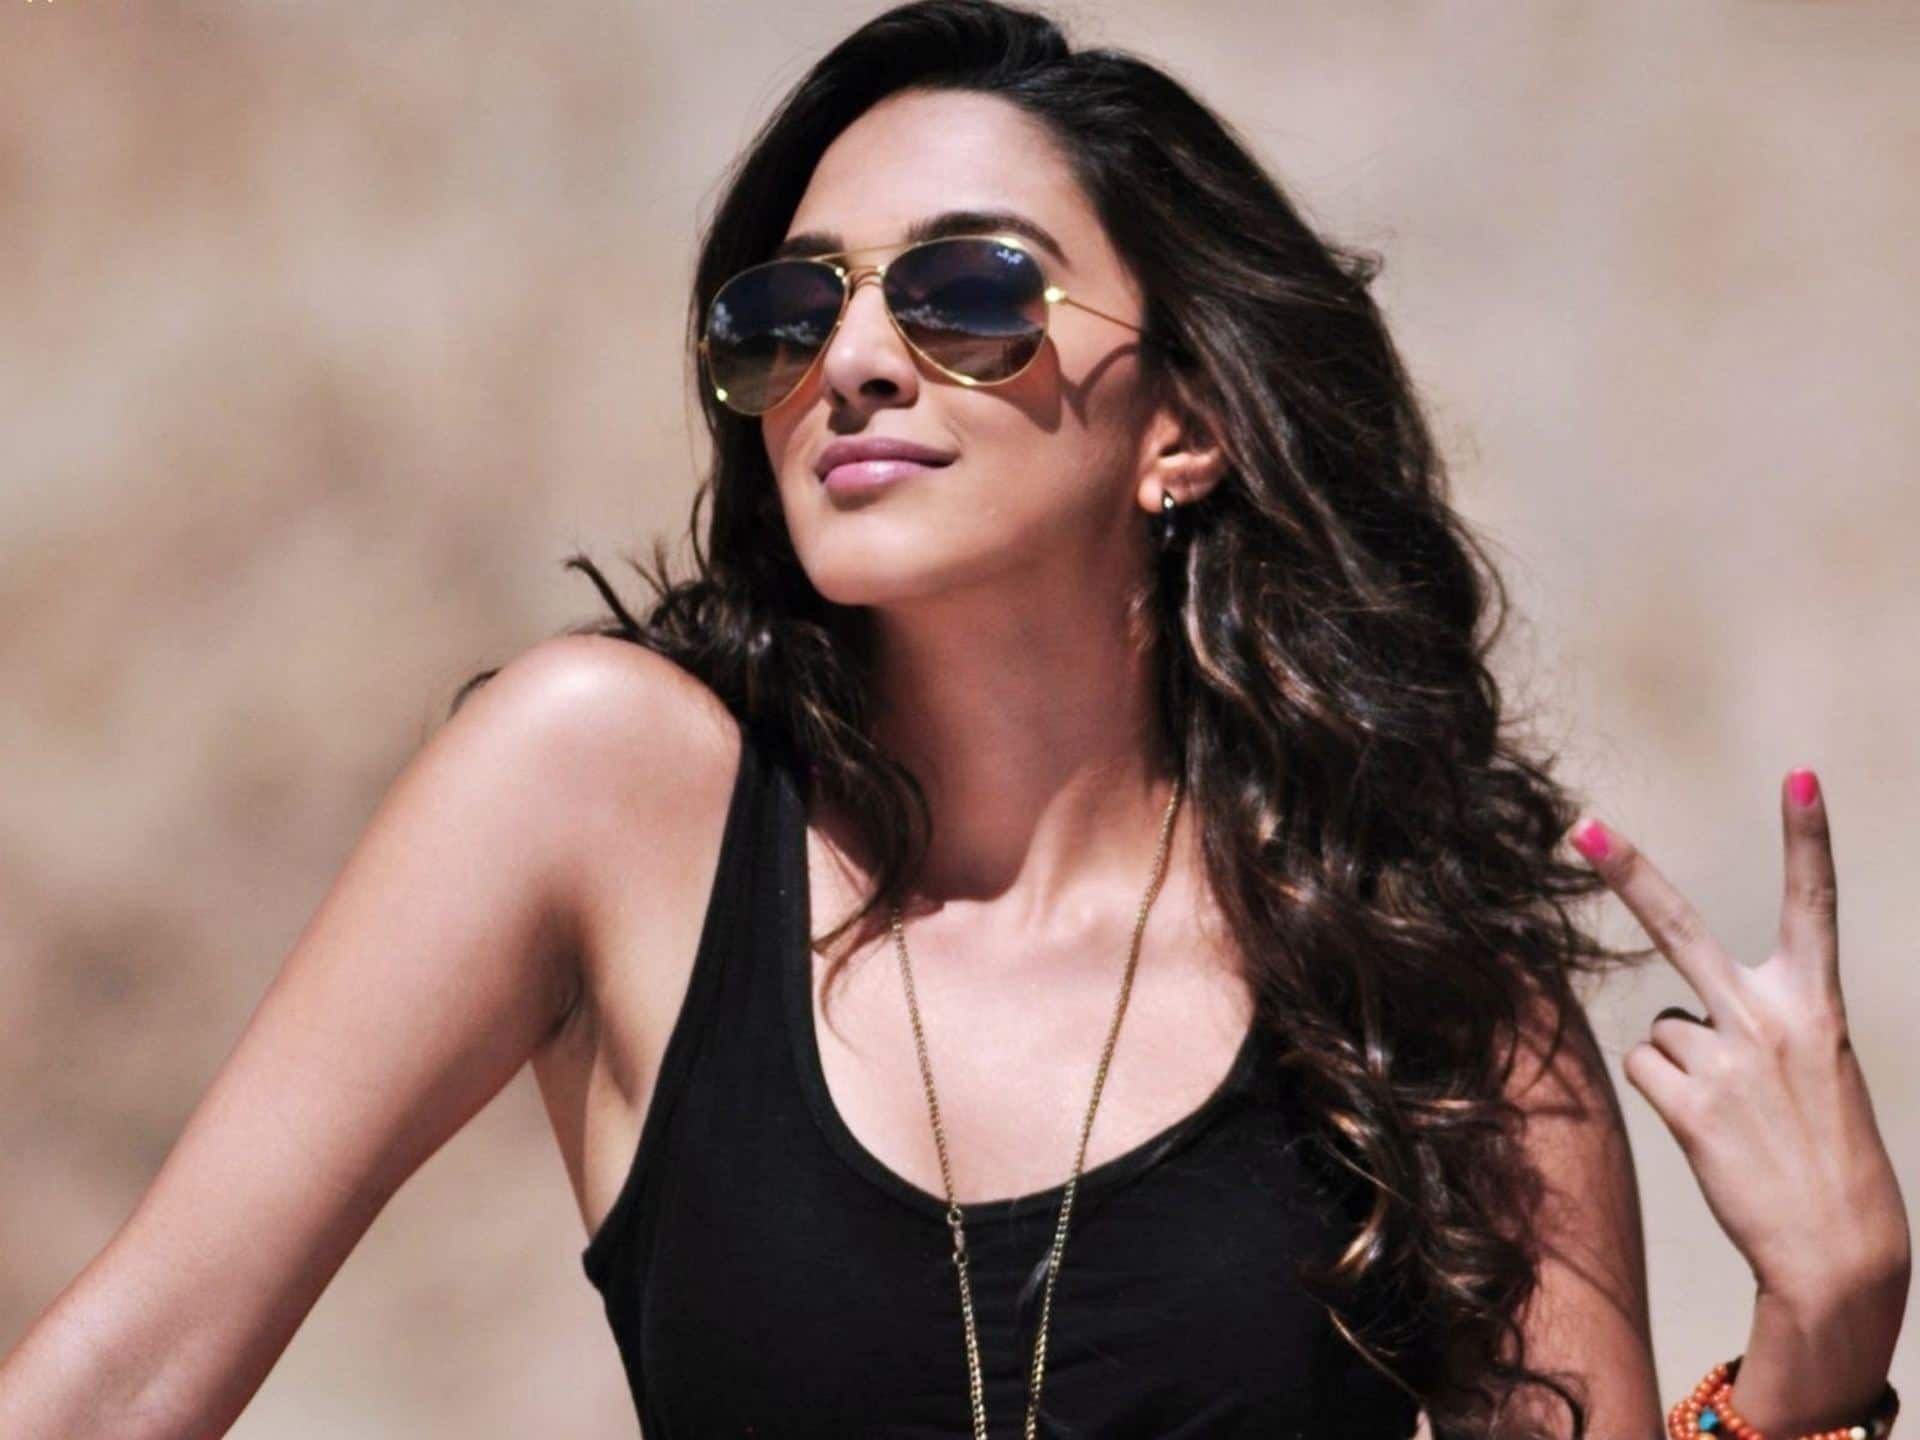 Kiara Advani celebrity cosmetologist Dr Monica Kapoor celebrity surgeon